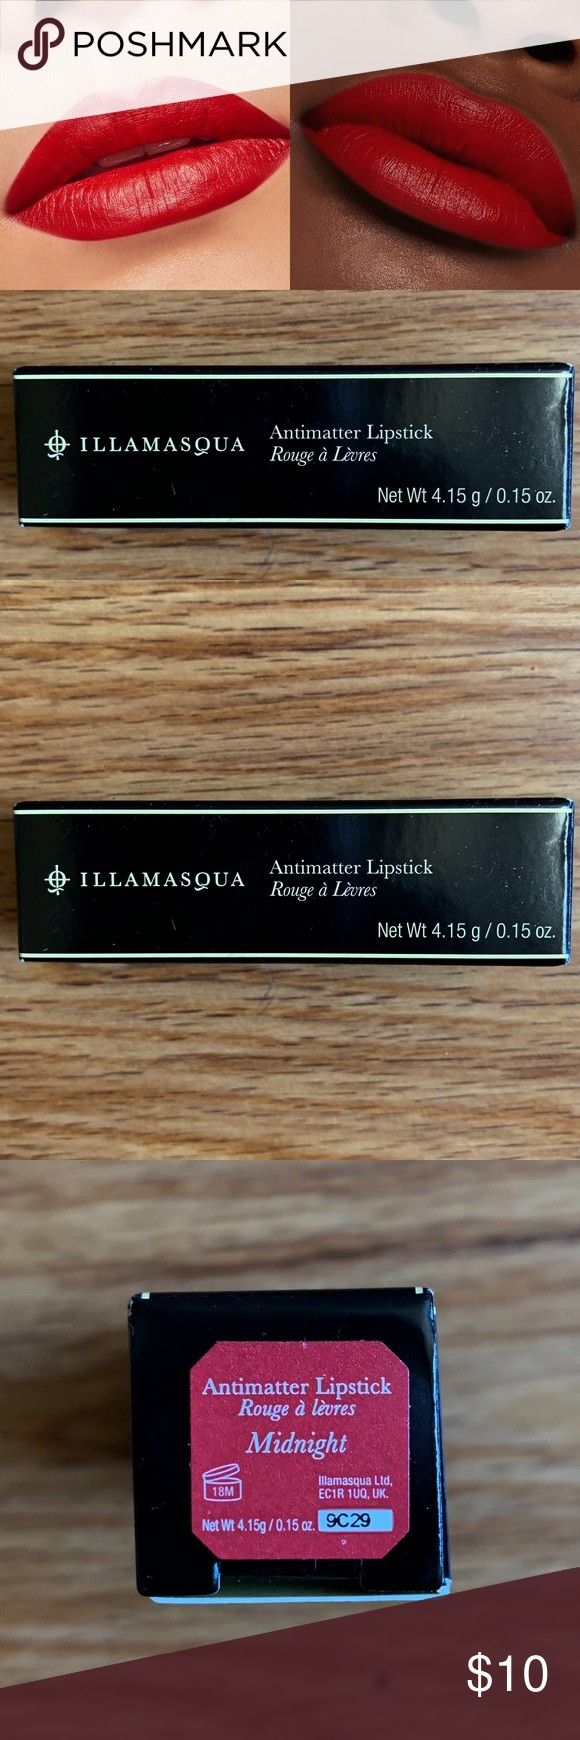 Illamasqua Antimatter Lipstick in Midnight Illamasquas Antimatter lipsticks are well known for the